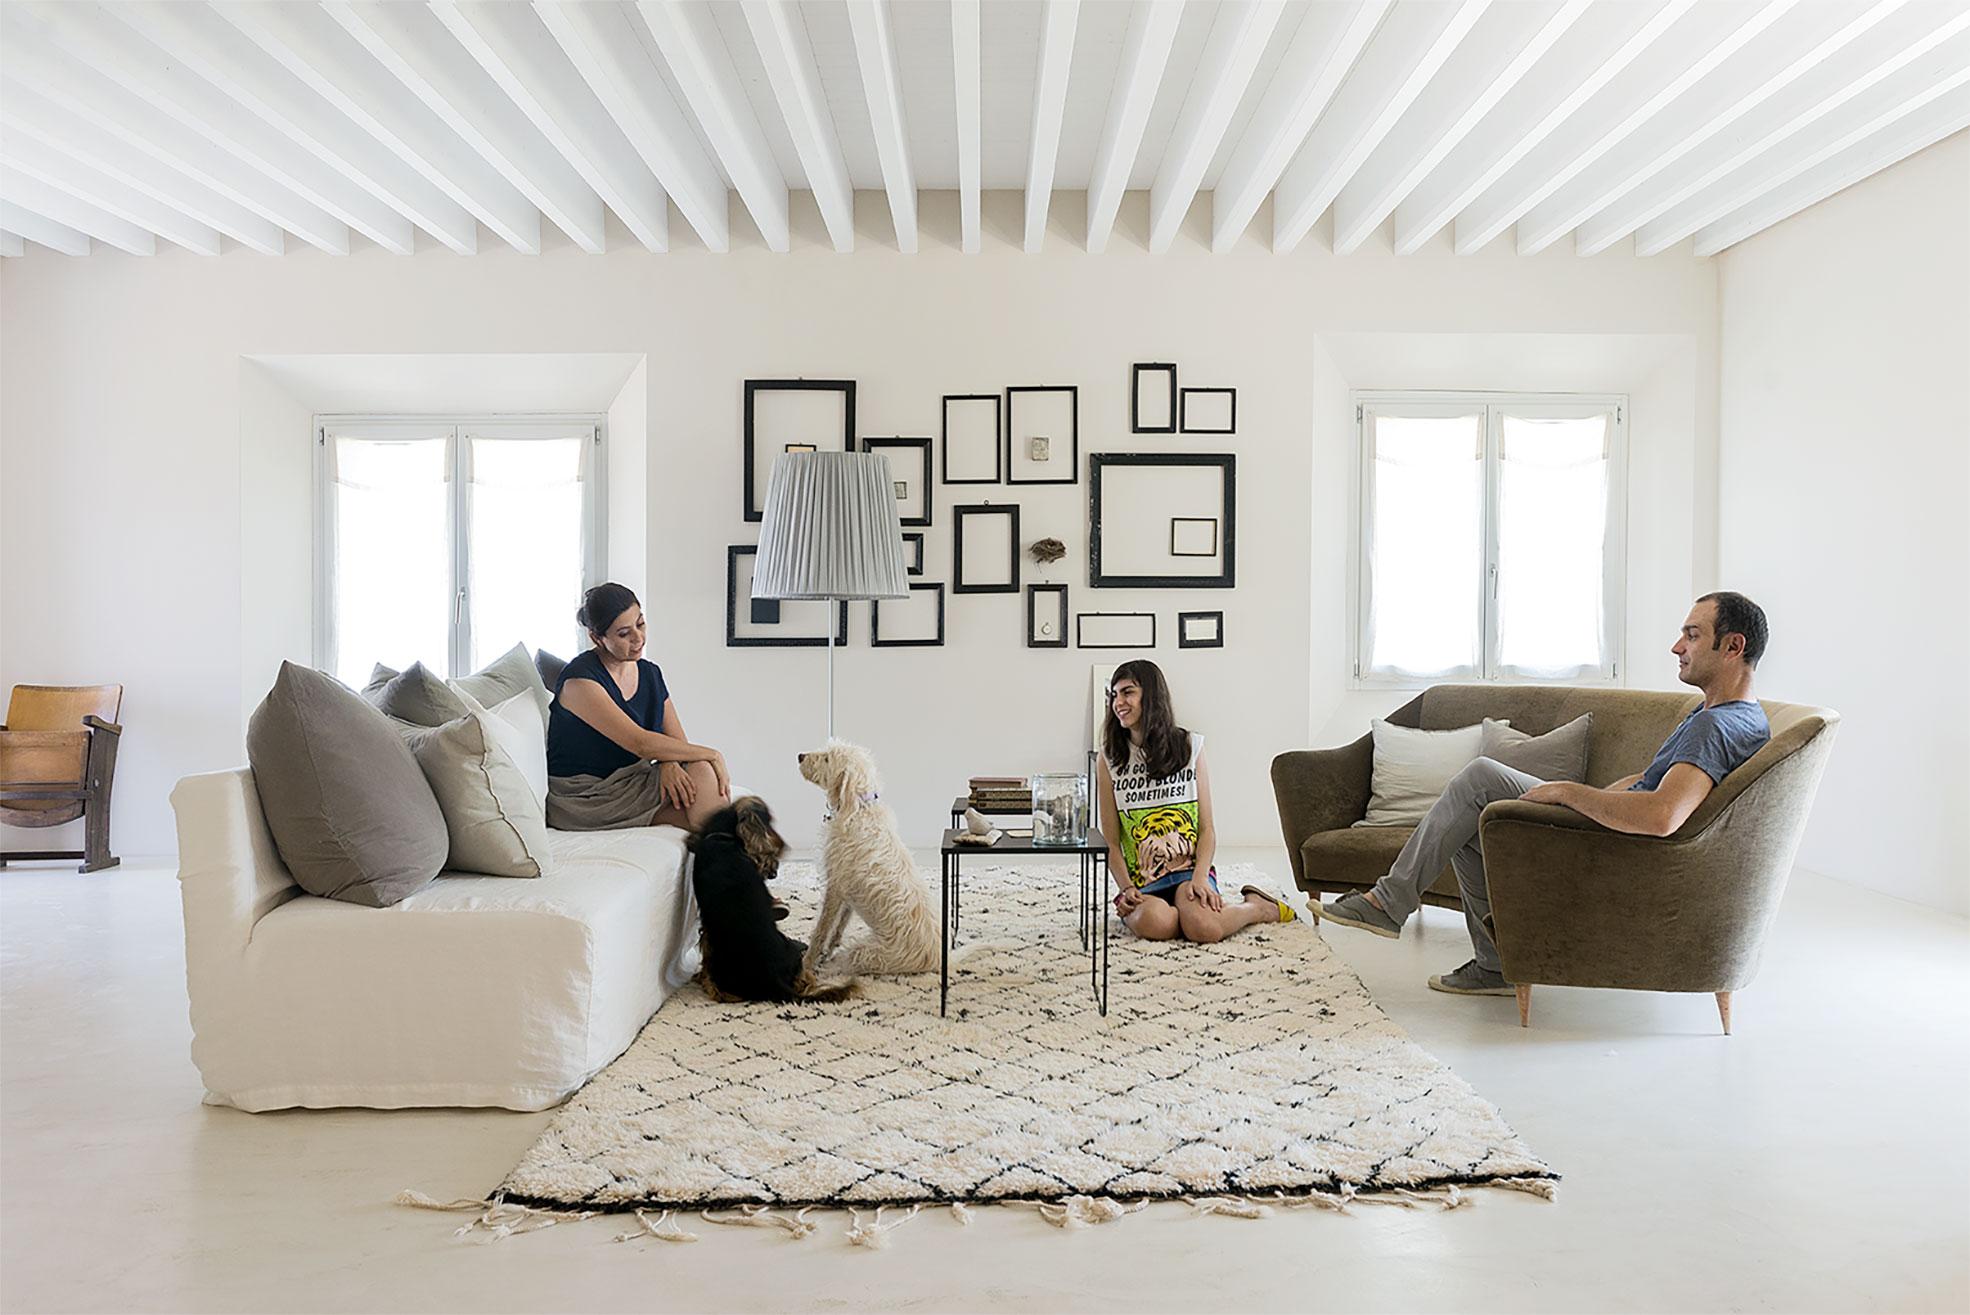 The family owner of Malatetsa in their living room Photographer Maria Teresa Furnari